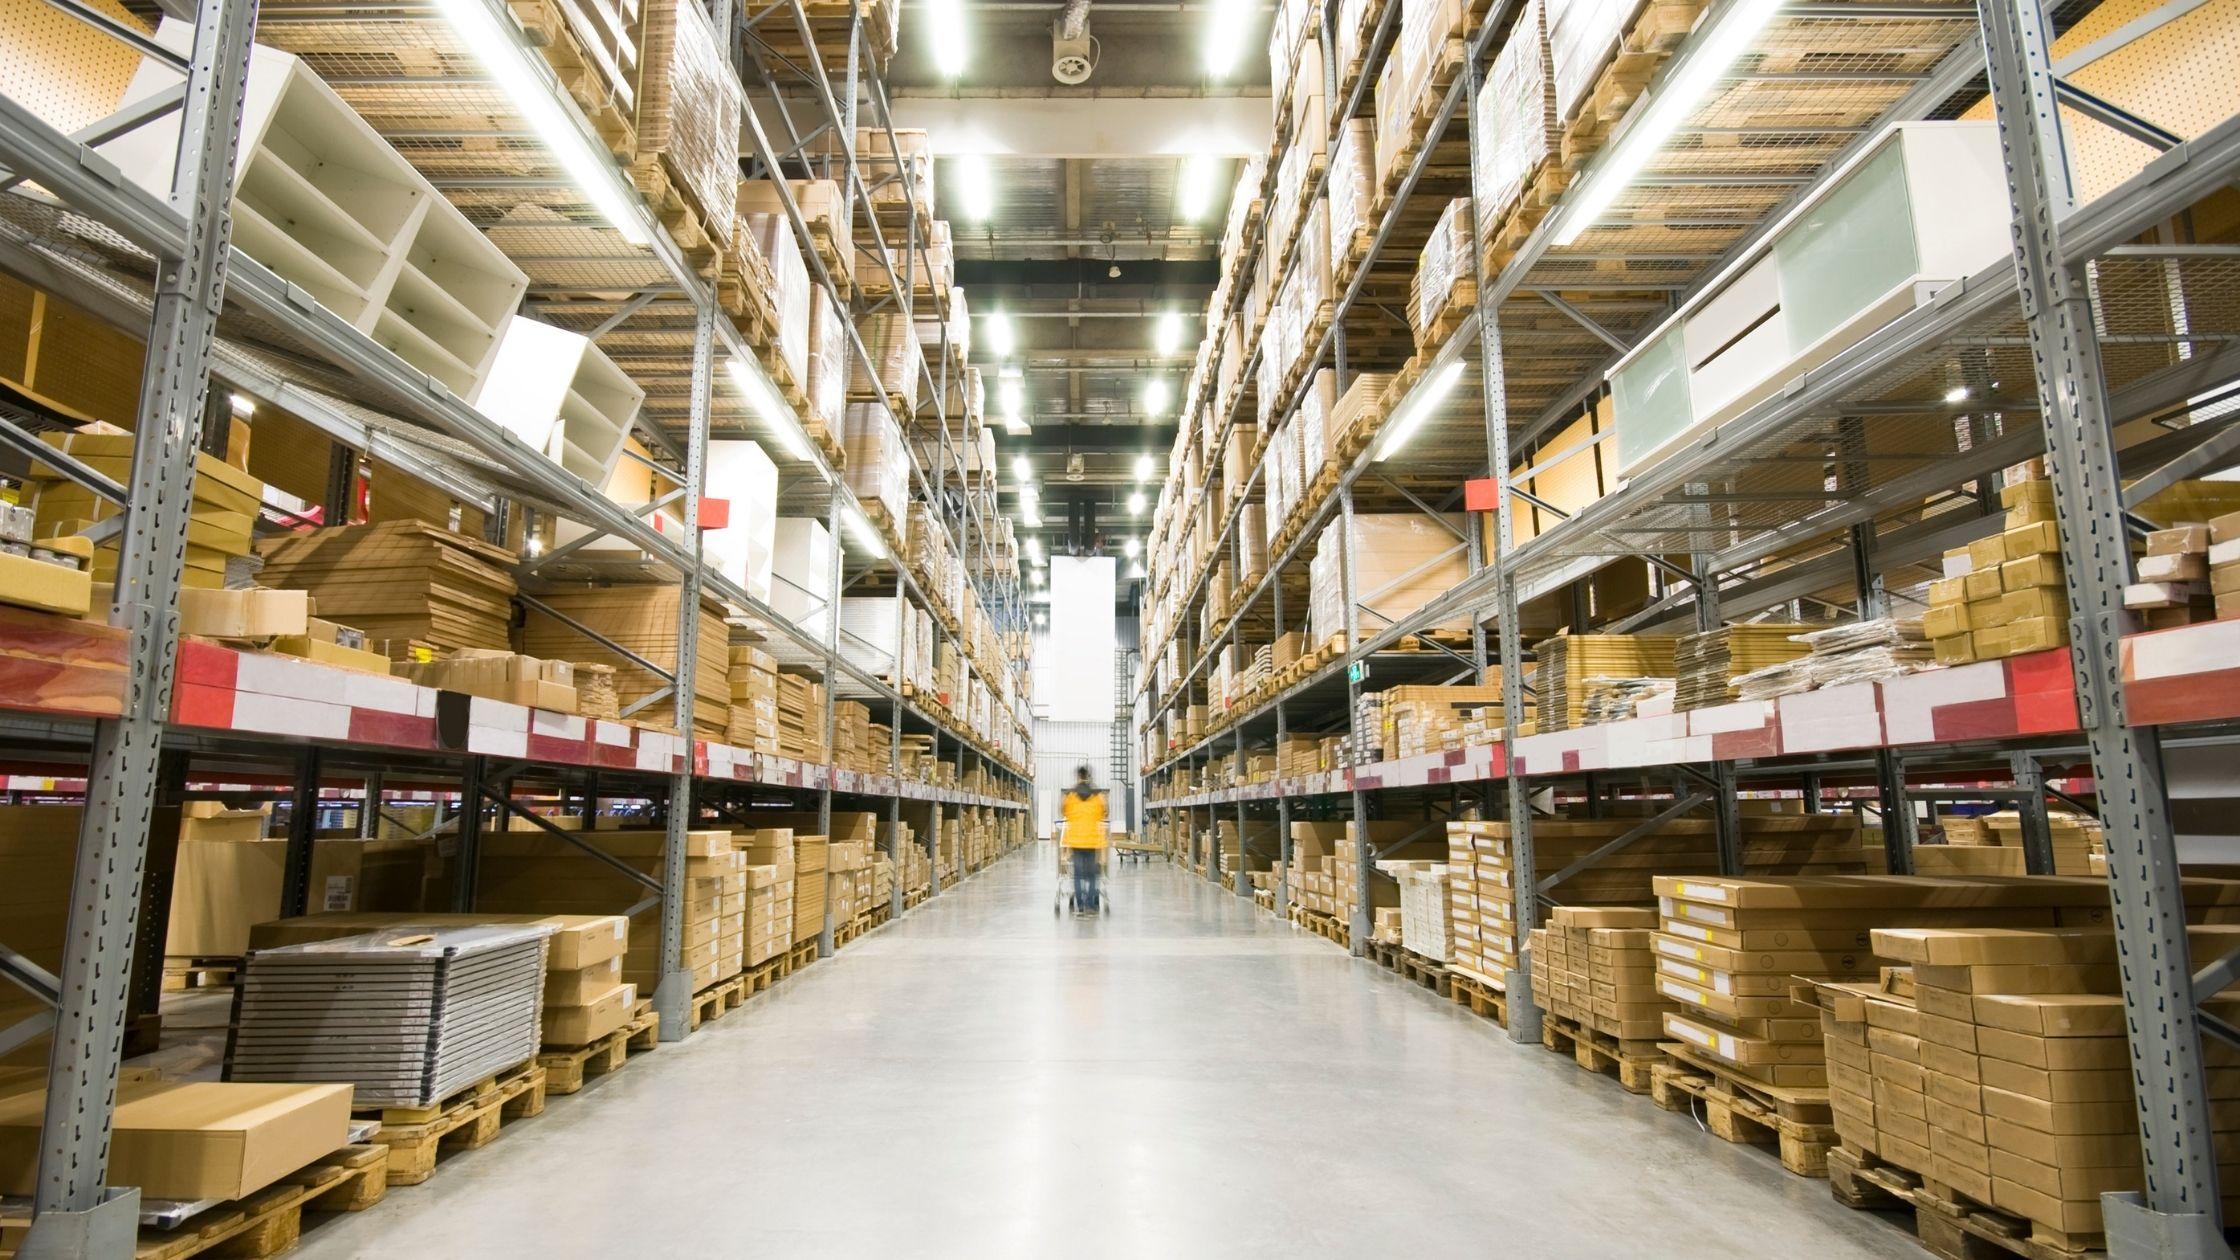 Top 3 Inefficiencies in Returns Management That Are Costing Retailers BIG